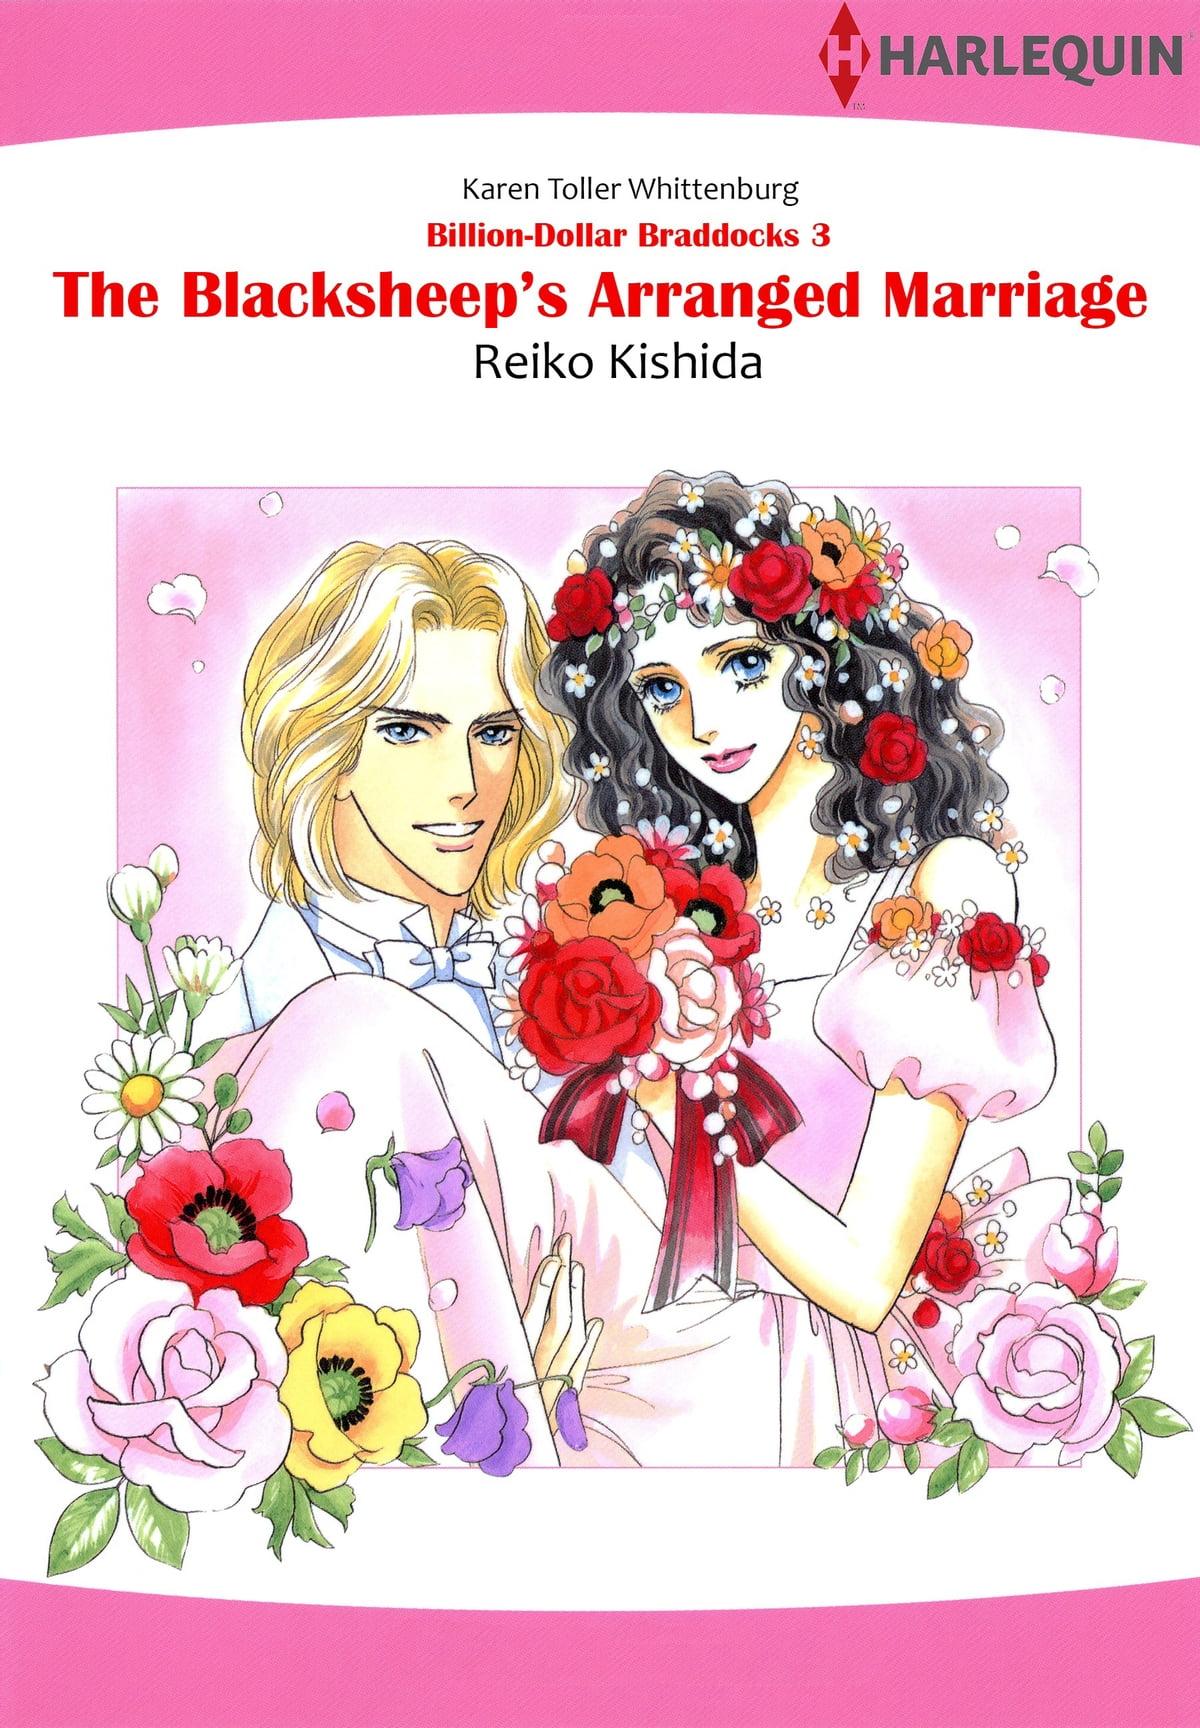 The Blacksheep's Arranged Marriage (Harlequin Comics) eBook by Karen Toller Whittenburg - 9784596682758 | Rakuten Kobo